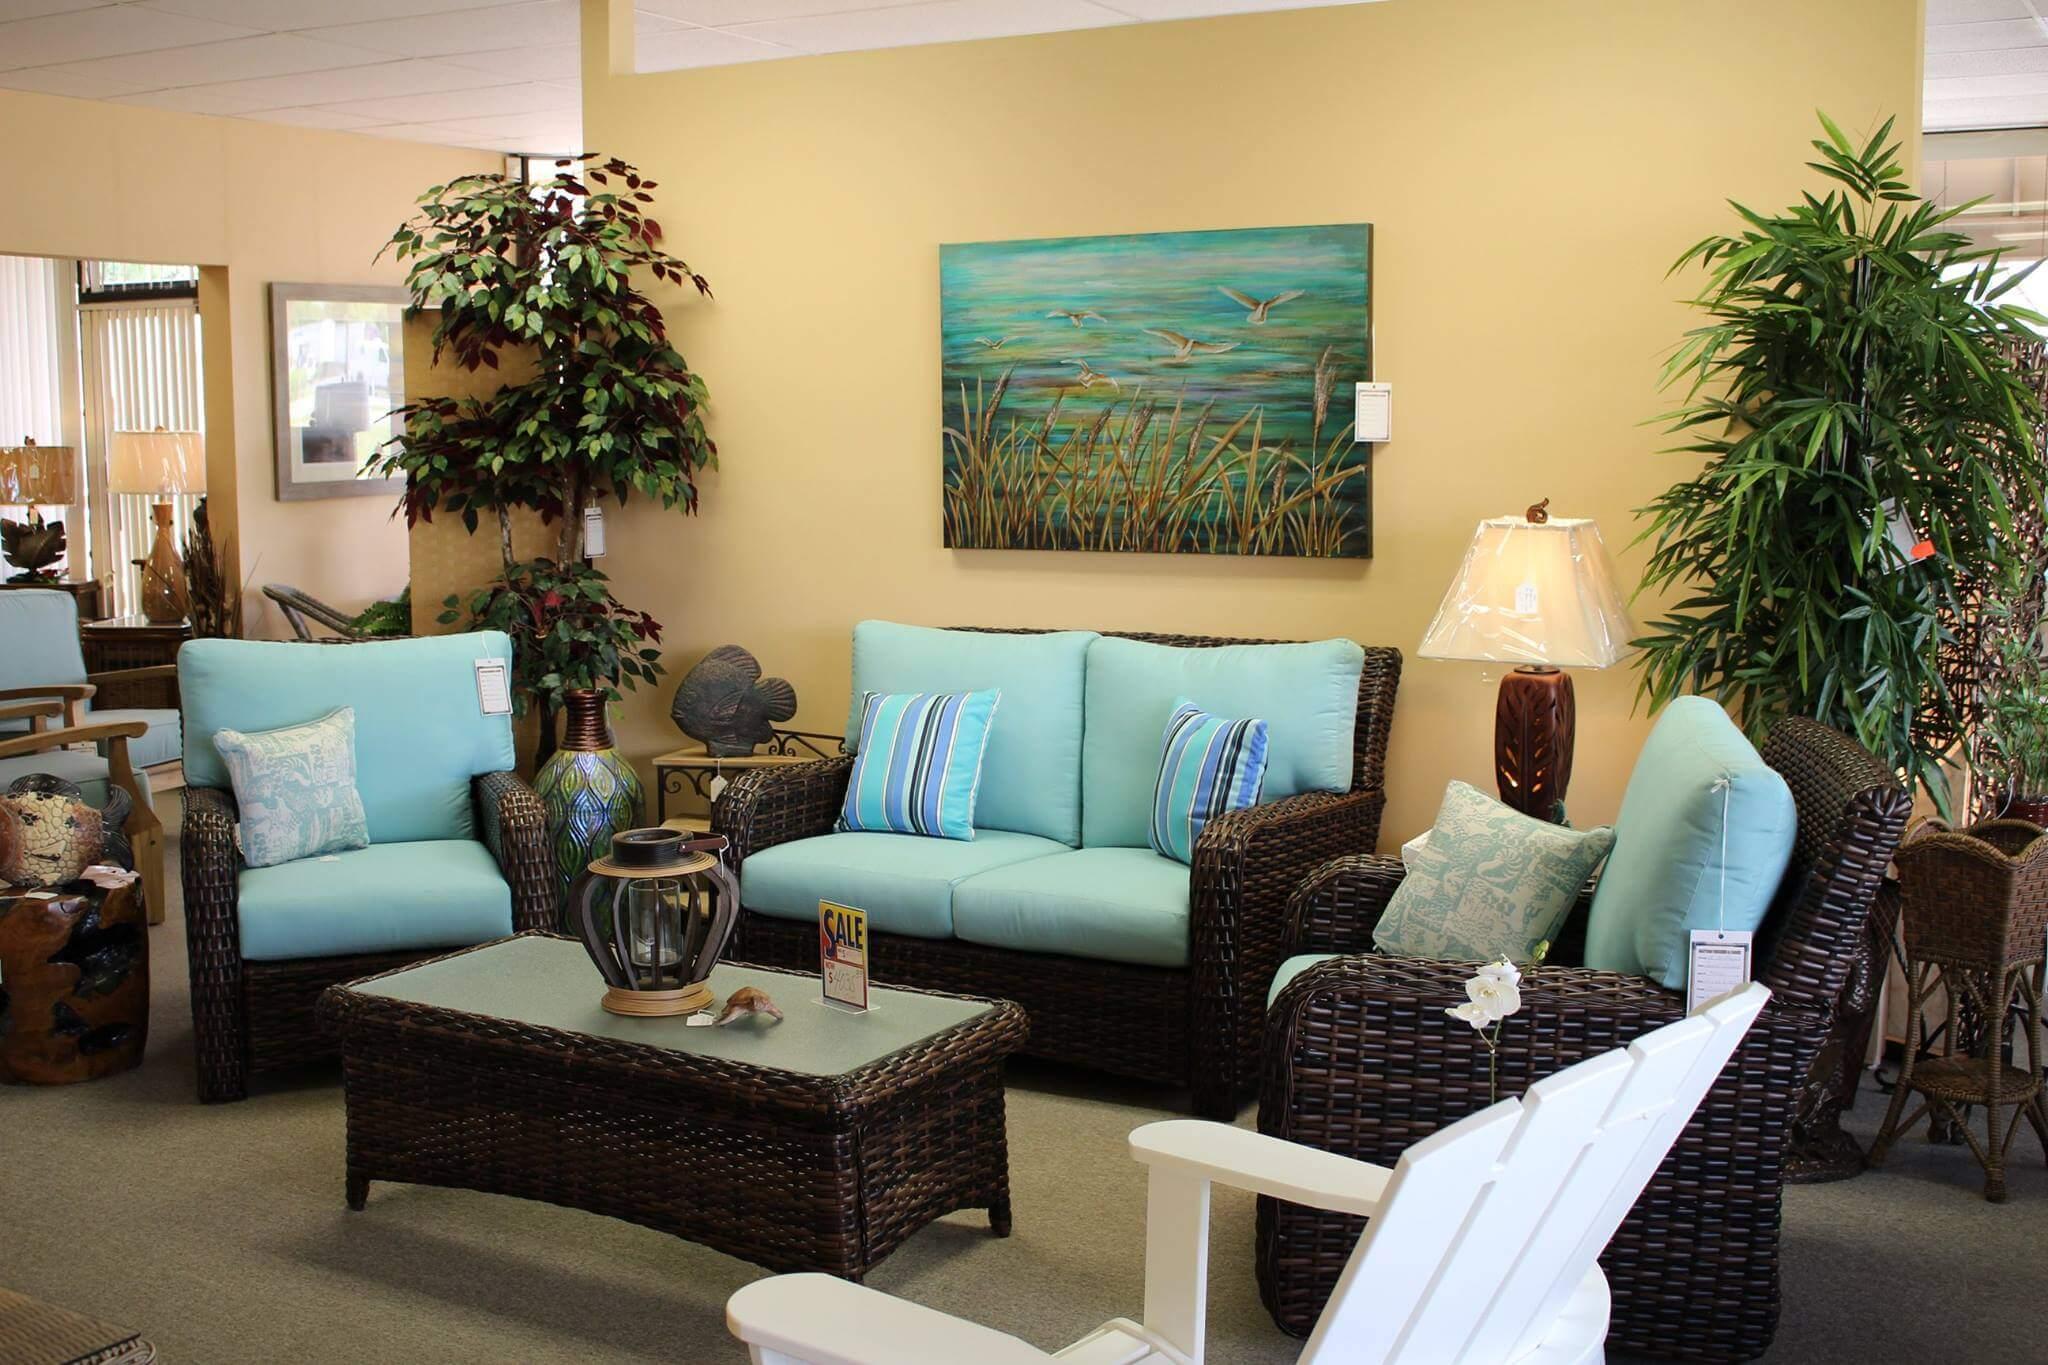 Furniture Showroom In Venice Fl Home Furnishings Store